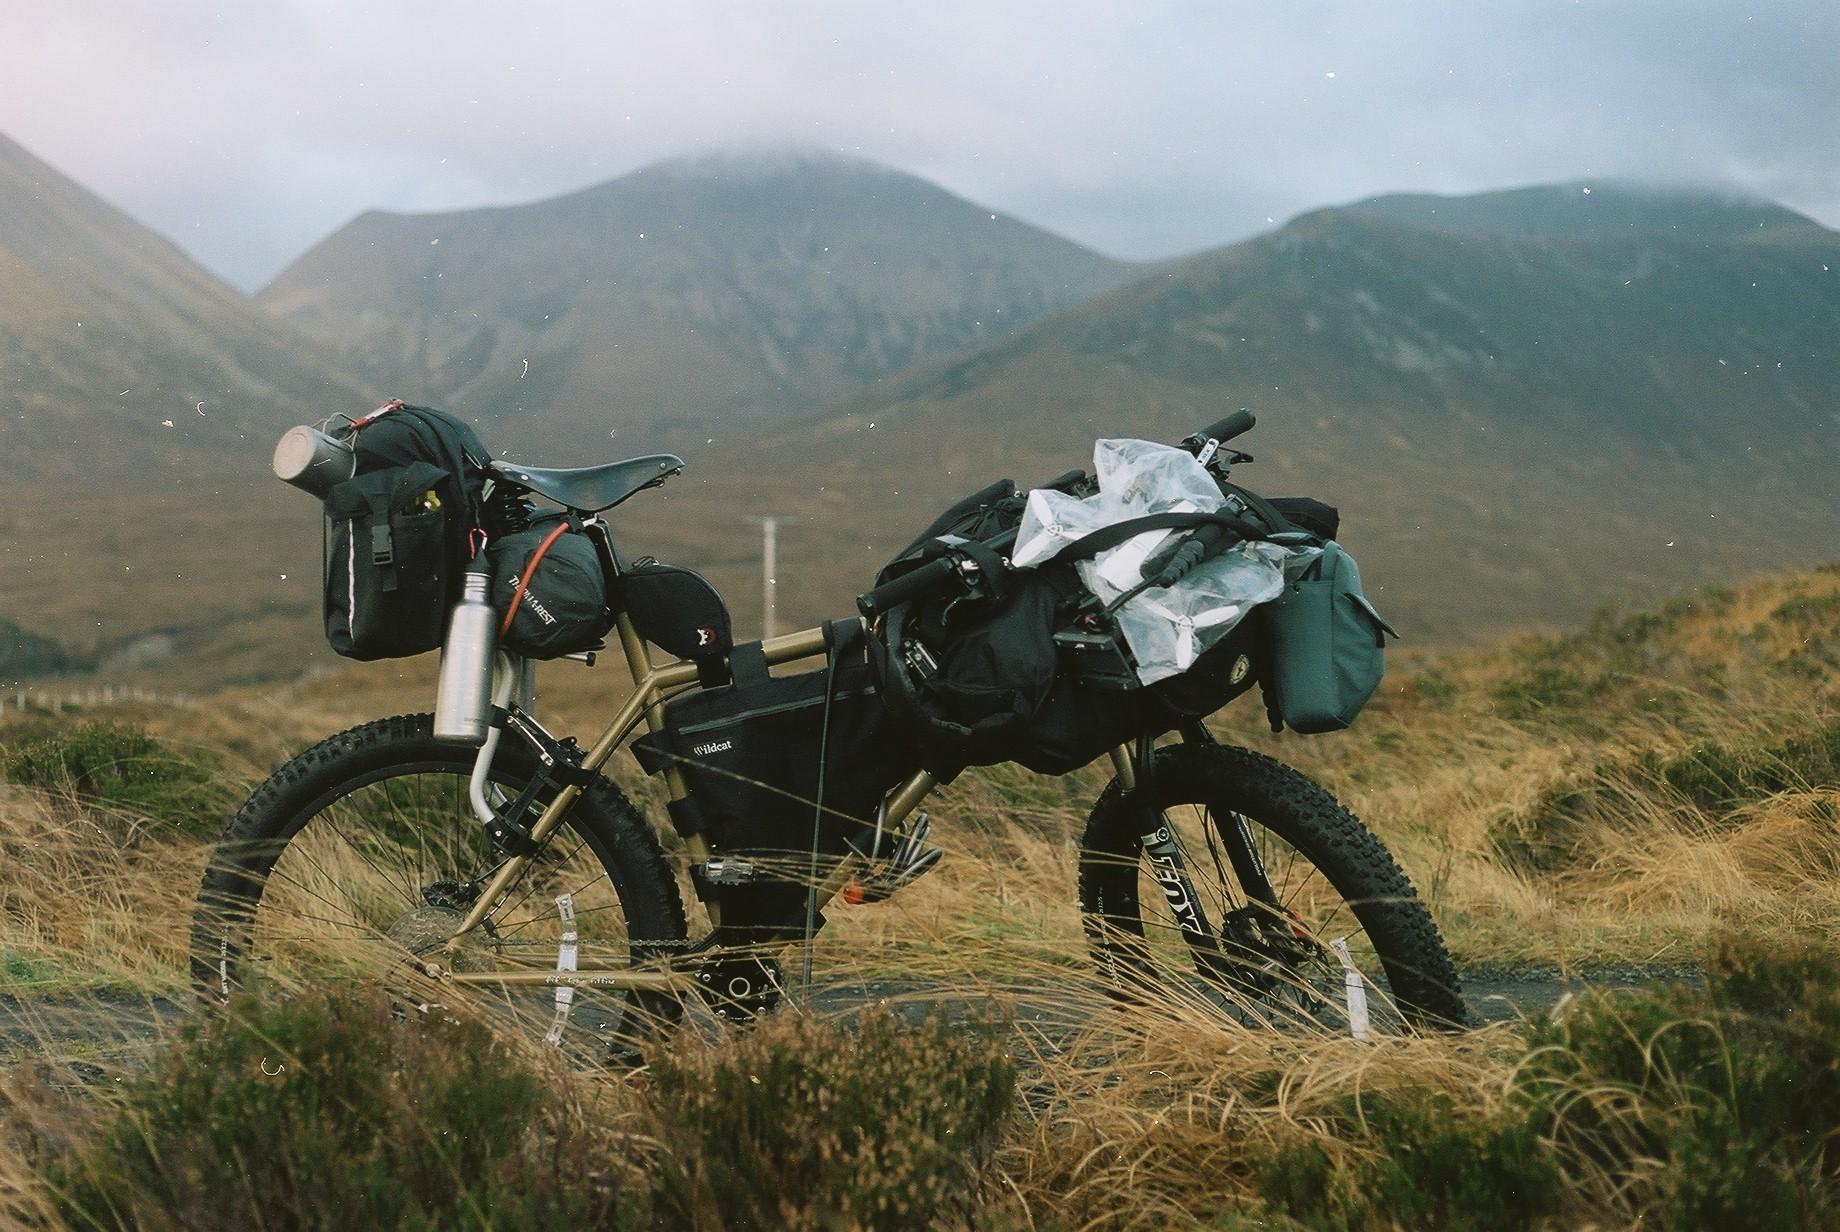 film is not dead, canon, canon ae1, ae1, kodak, kodak film, kodak portra, portra 160, analog photography, film photography, jack macgowan, bikepacking, bikepacking blog, cycling blog, travel photography, travel blog, skye, isle of skye, scottish highlands, bikepacking scotland, bicycle touring apocalypse